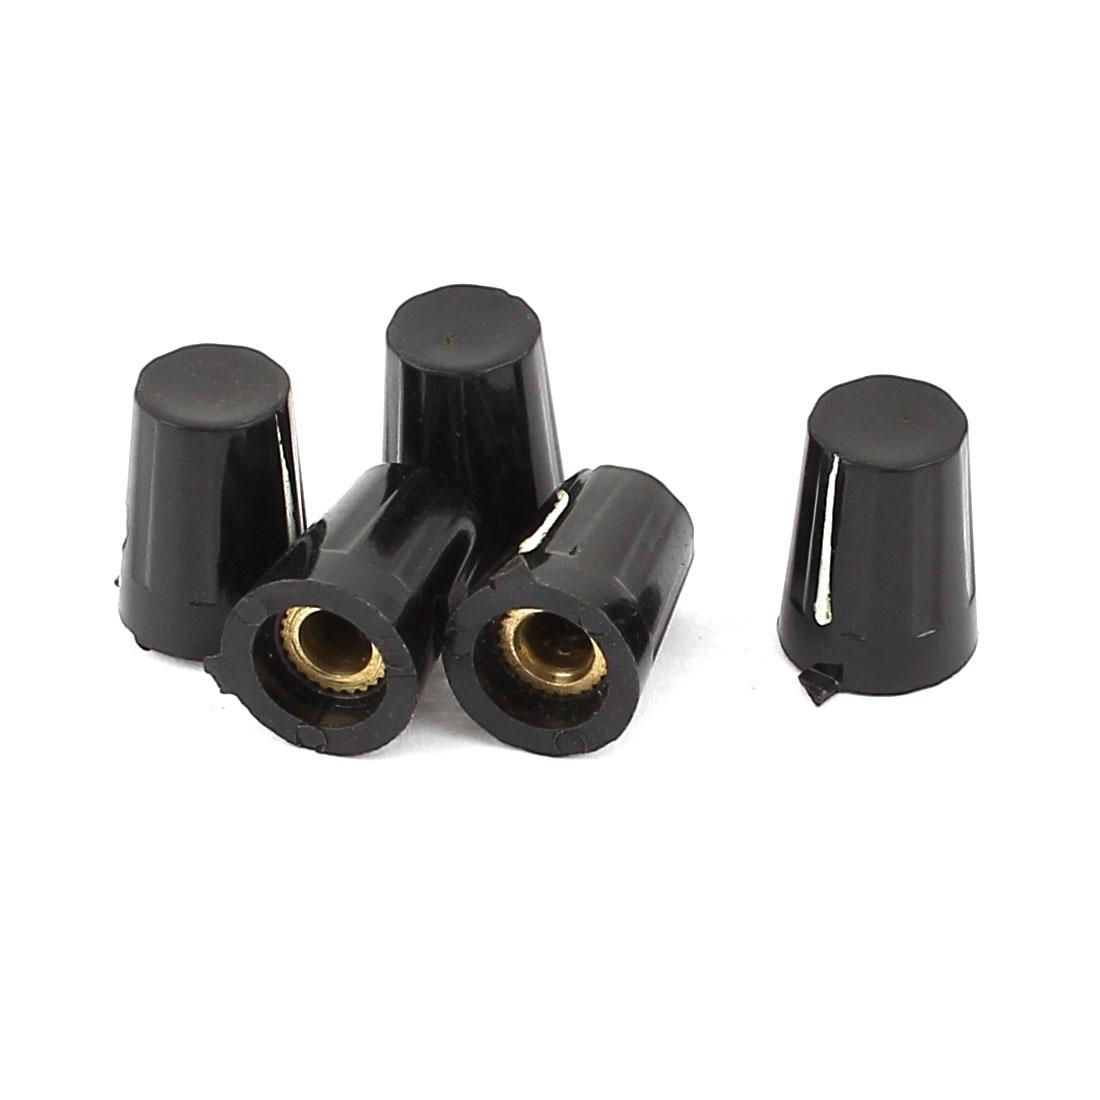 Plastic Knurled Grip 6mm Shaft Potentiometer Control Rotary Knob 5pcs